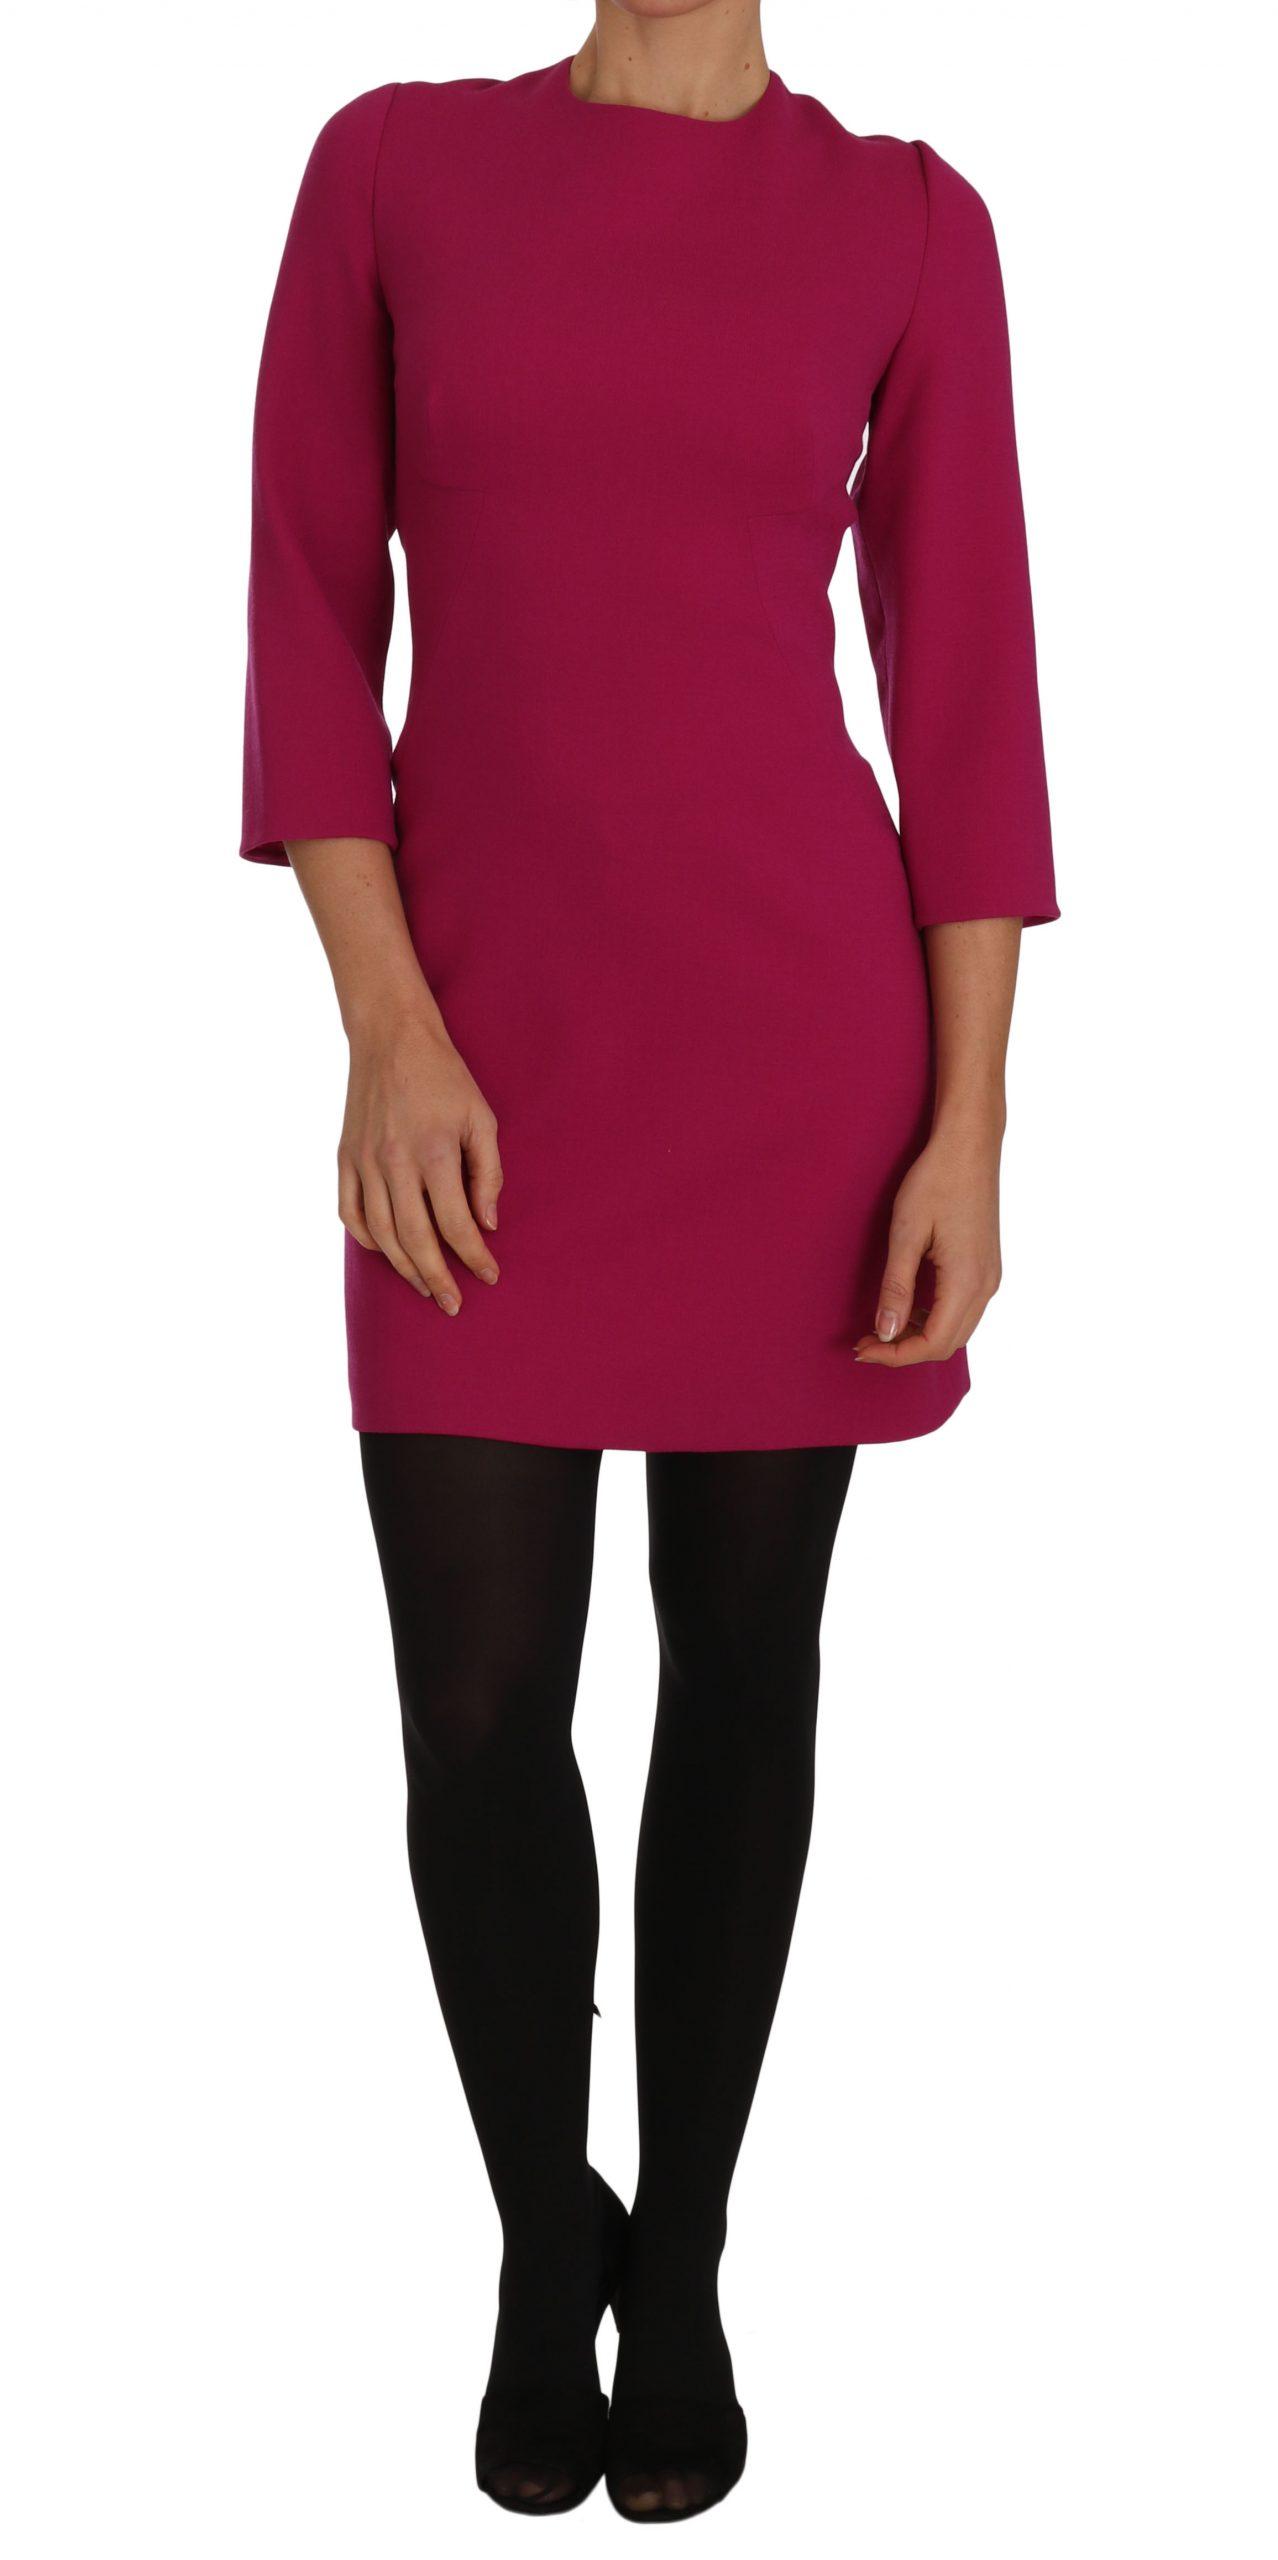 Dolce & Gabbana Women's Crêpe Sheath Wool Mini-Length Dress Pink DR1470 - IT46   L